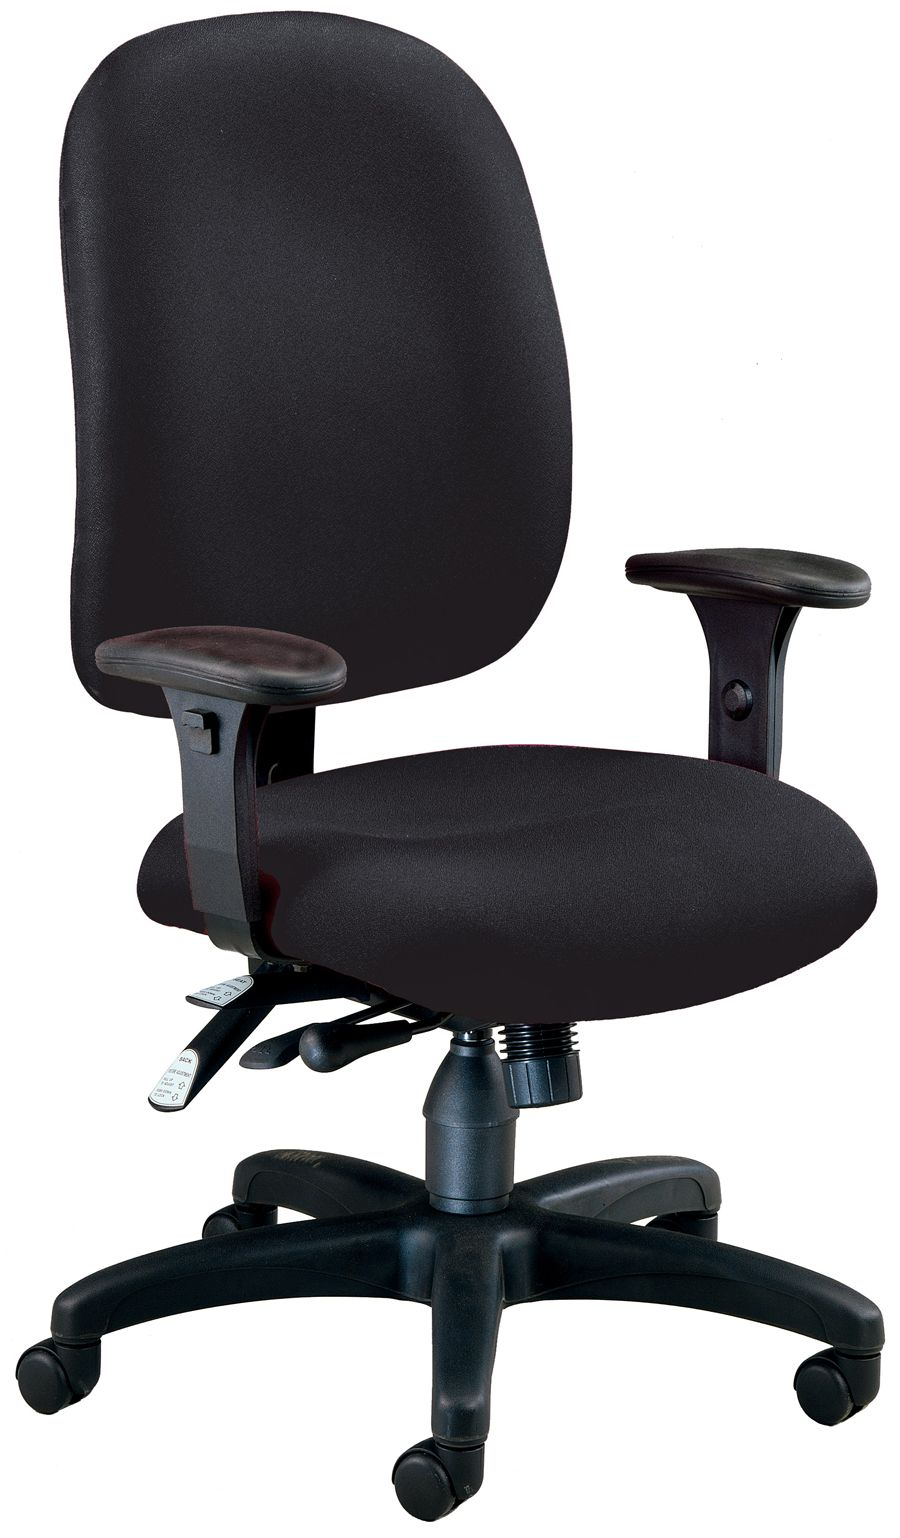 Black Fabric Comfy Seat Ergonomic Executive / Computer